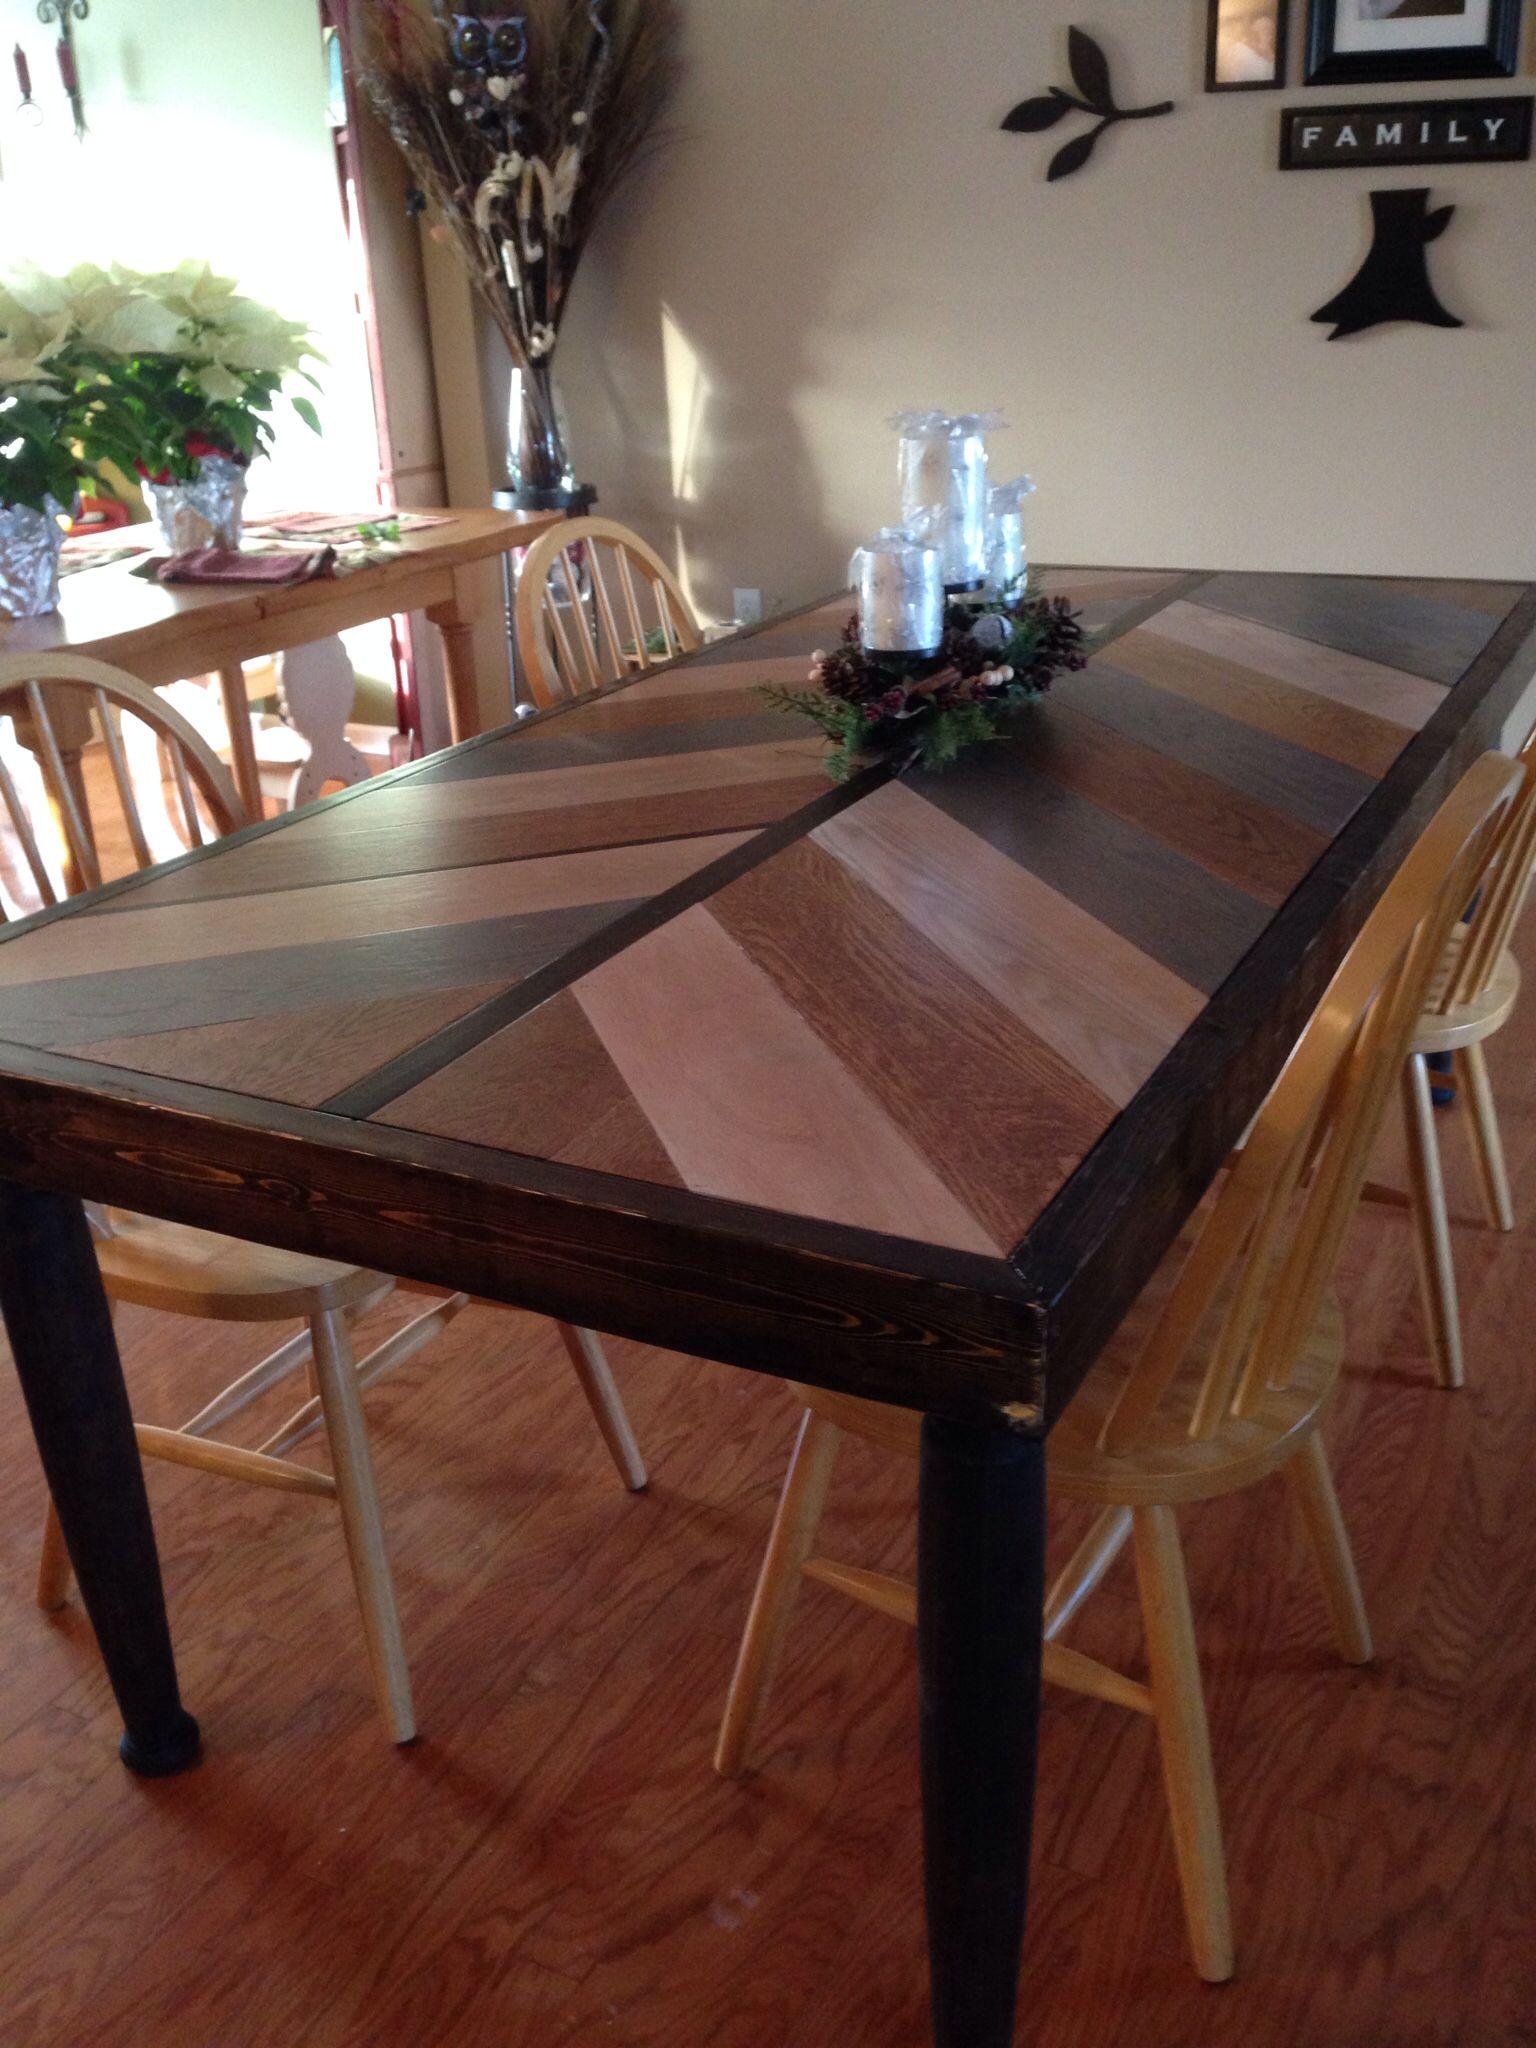 My chevron table. 7ft x 40in